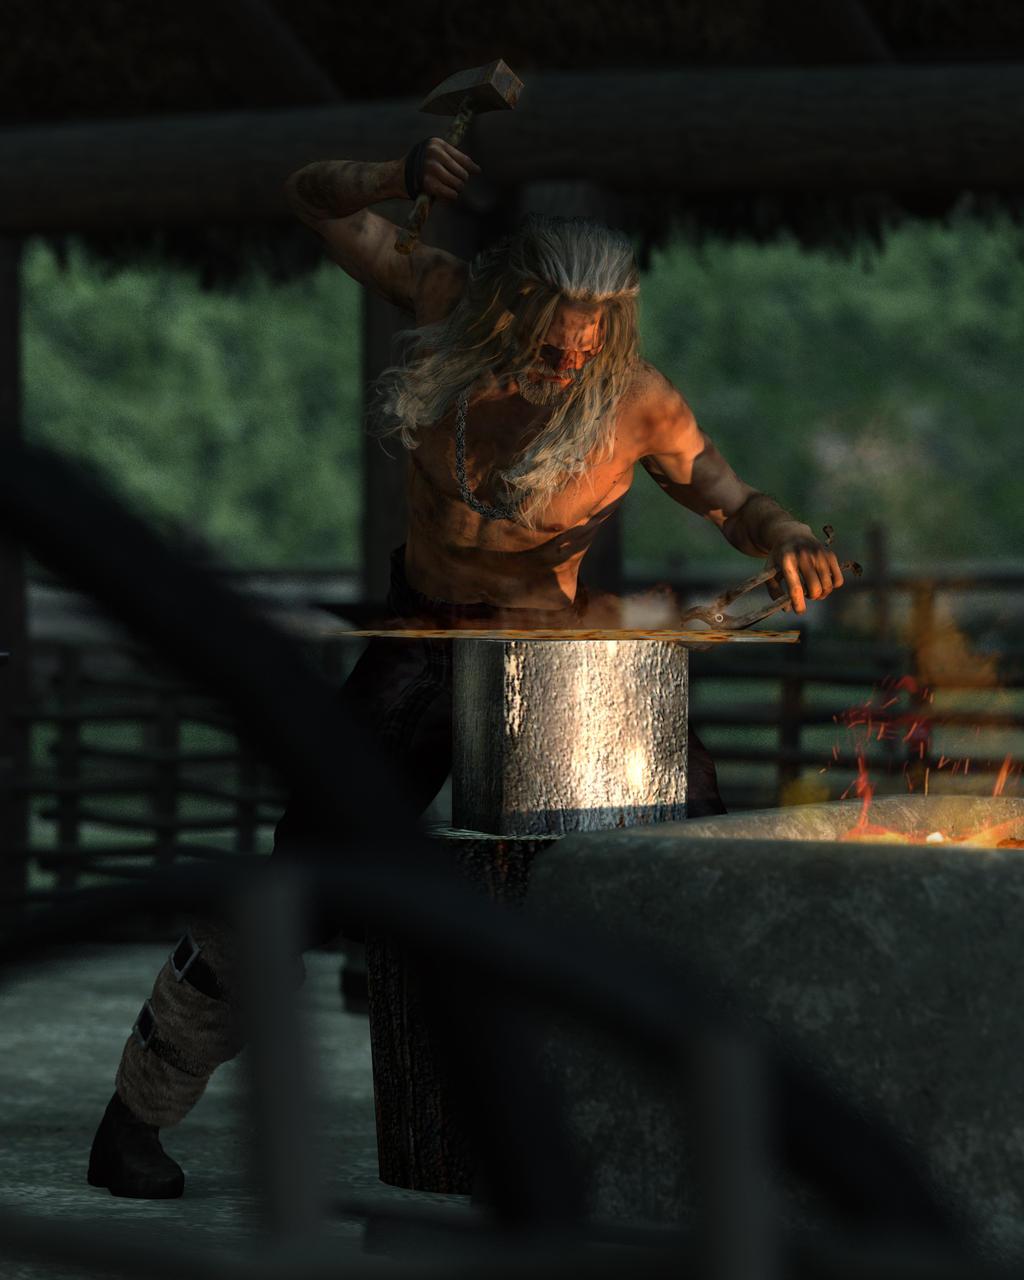 Snorri the Blacksmith